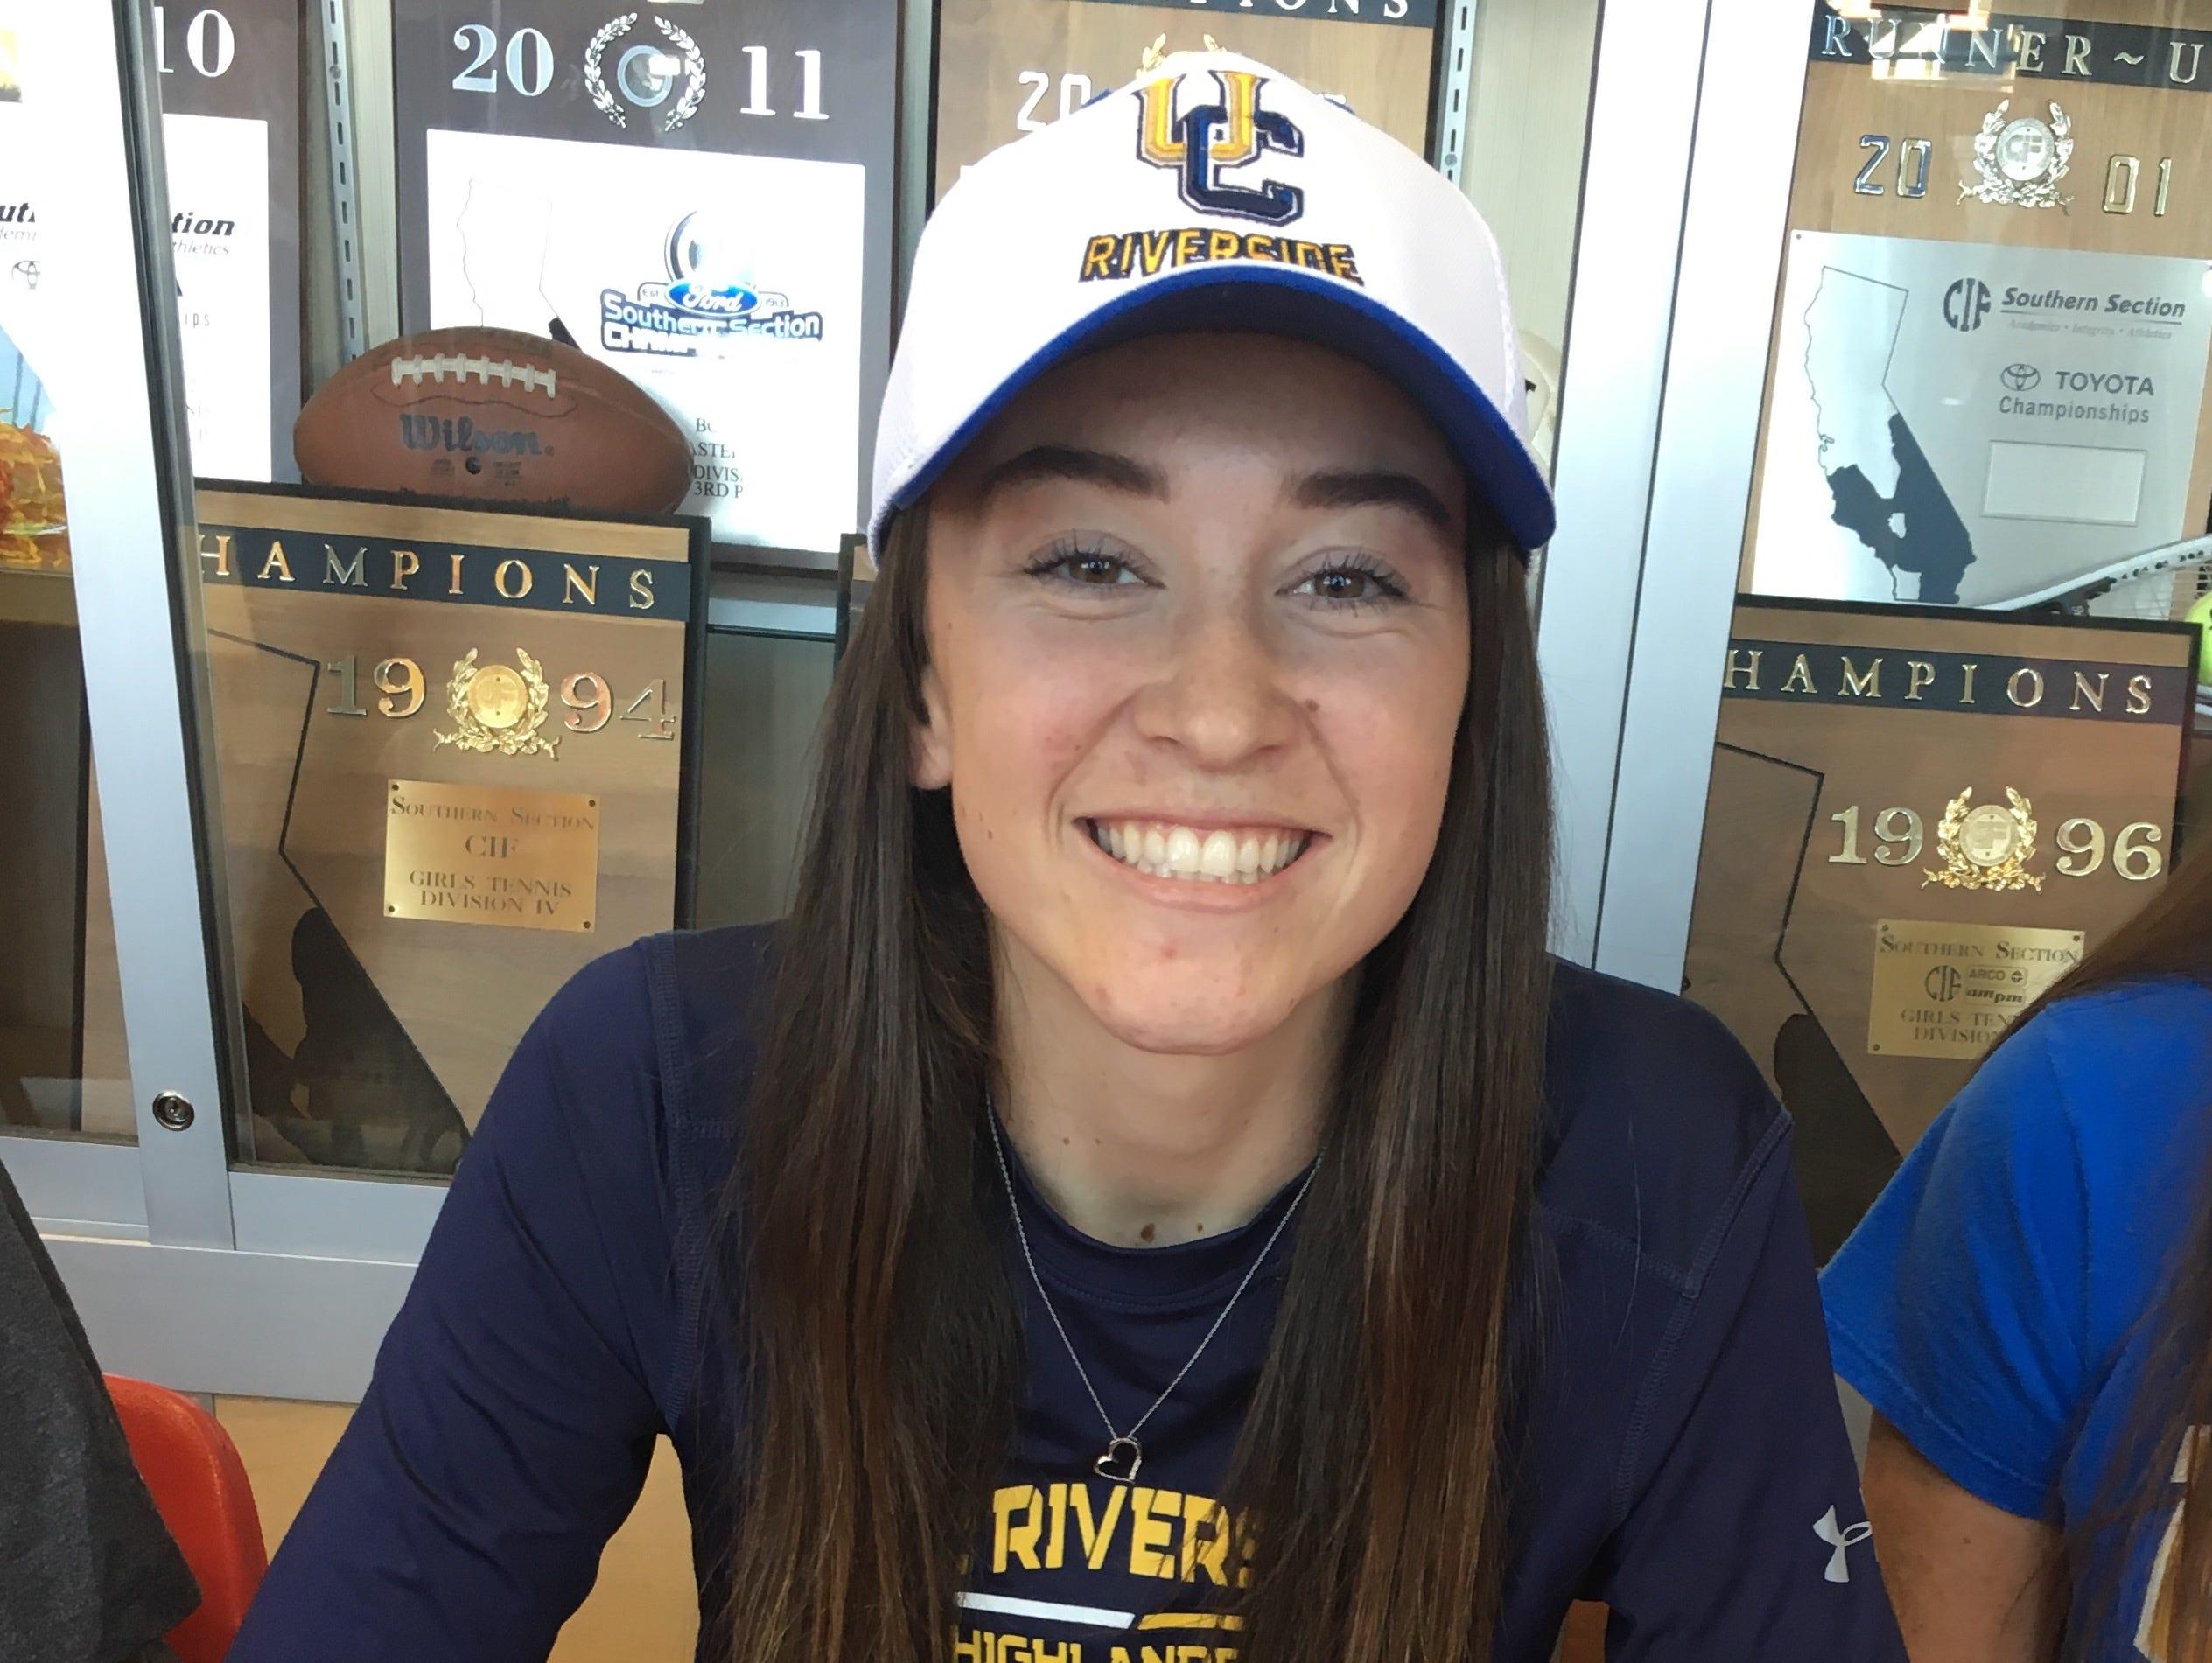 Jane Jordan, a Palm Desert girls' soccer player, will play college soccer at UC Riverside.